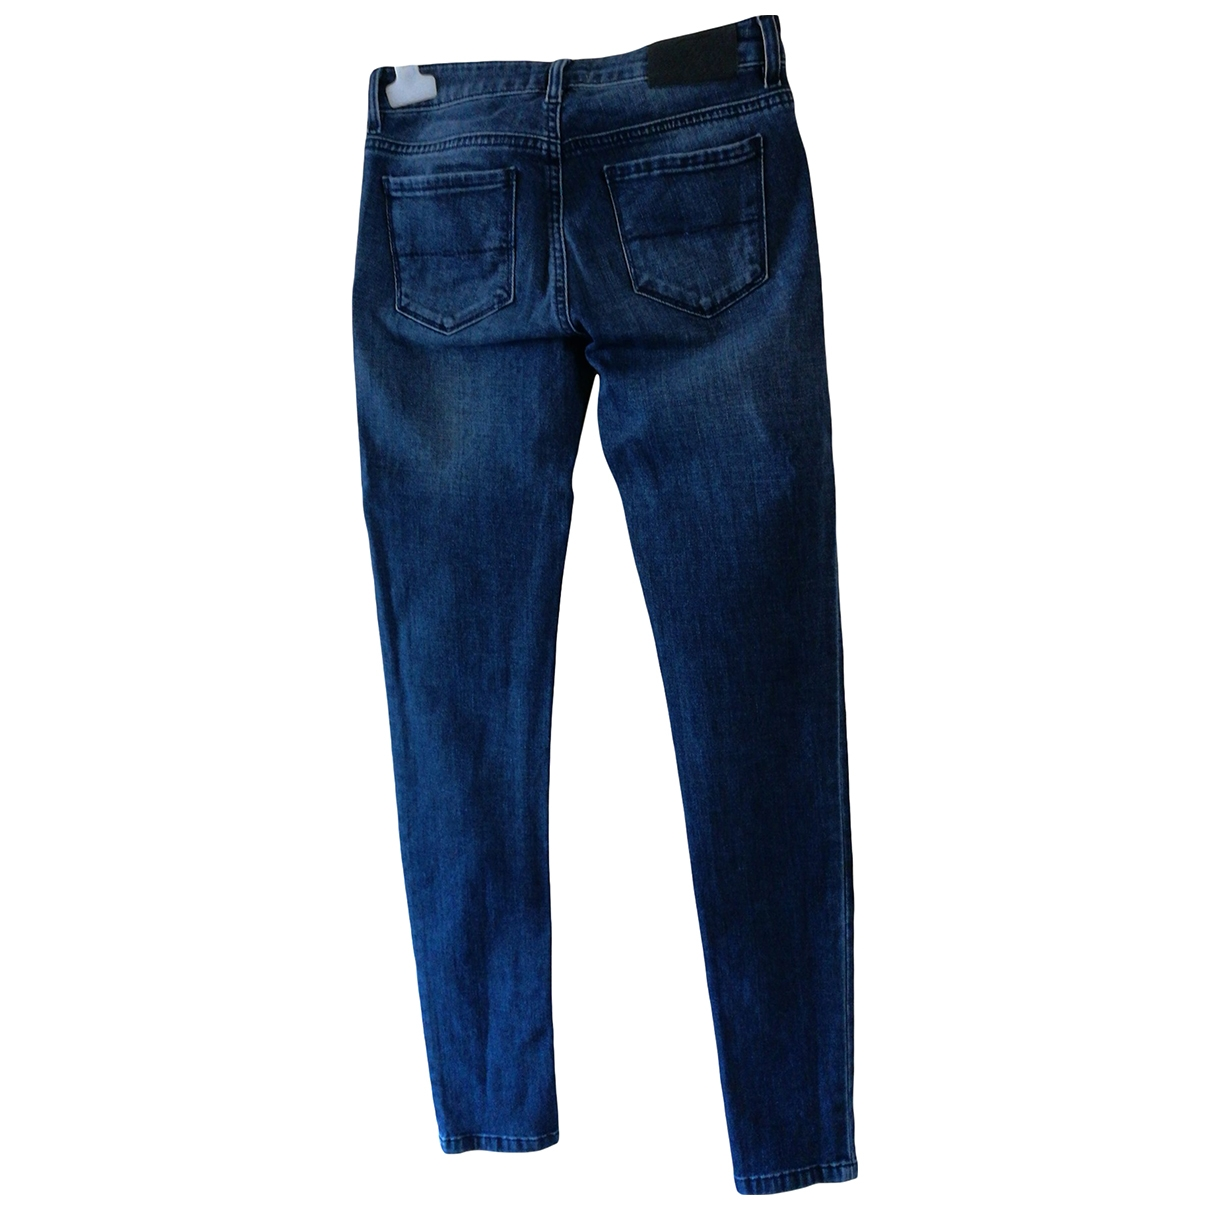 Fay \N Blue Denim - Jeans Jeans for Women 39 FR